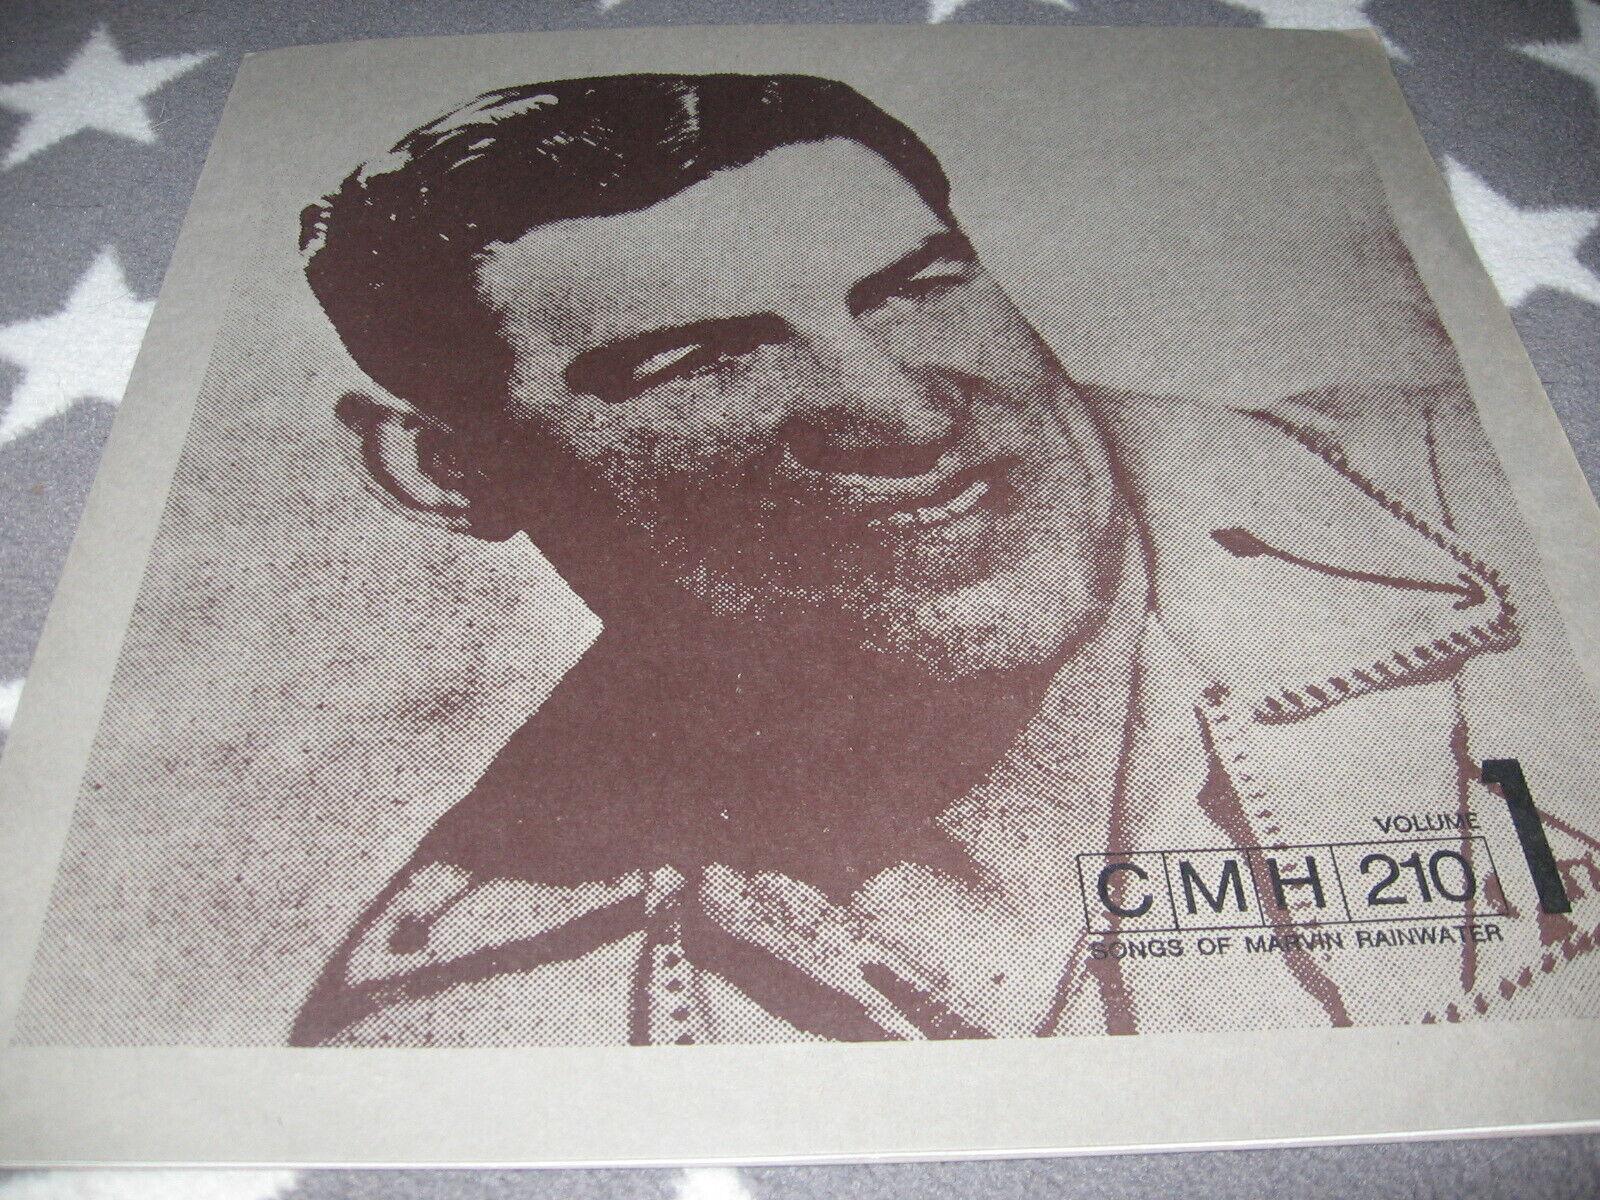 LP - Marvin Rainwater - Songs of M.R. Vol. 1 / CMH 210